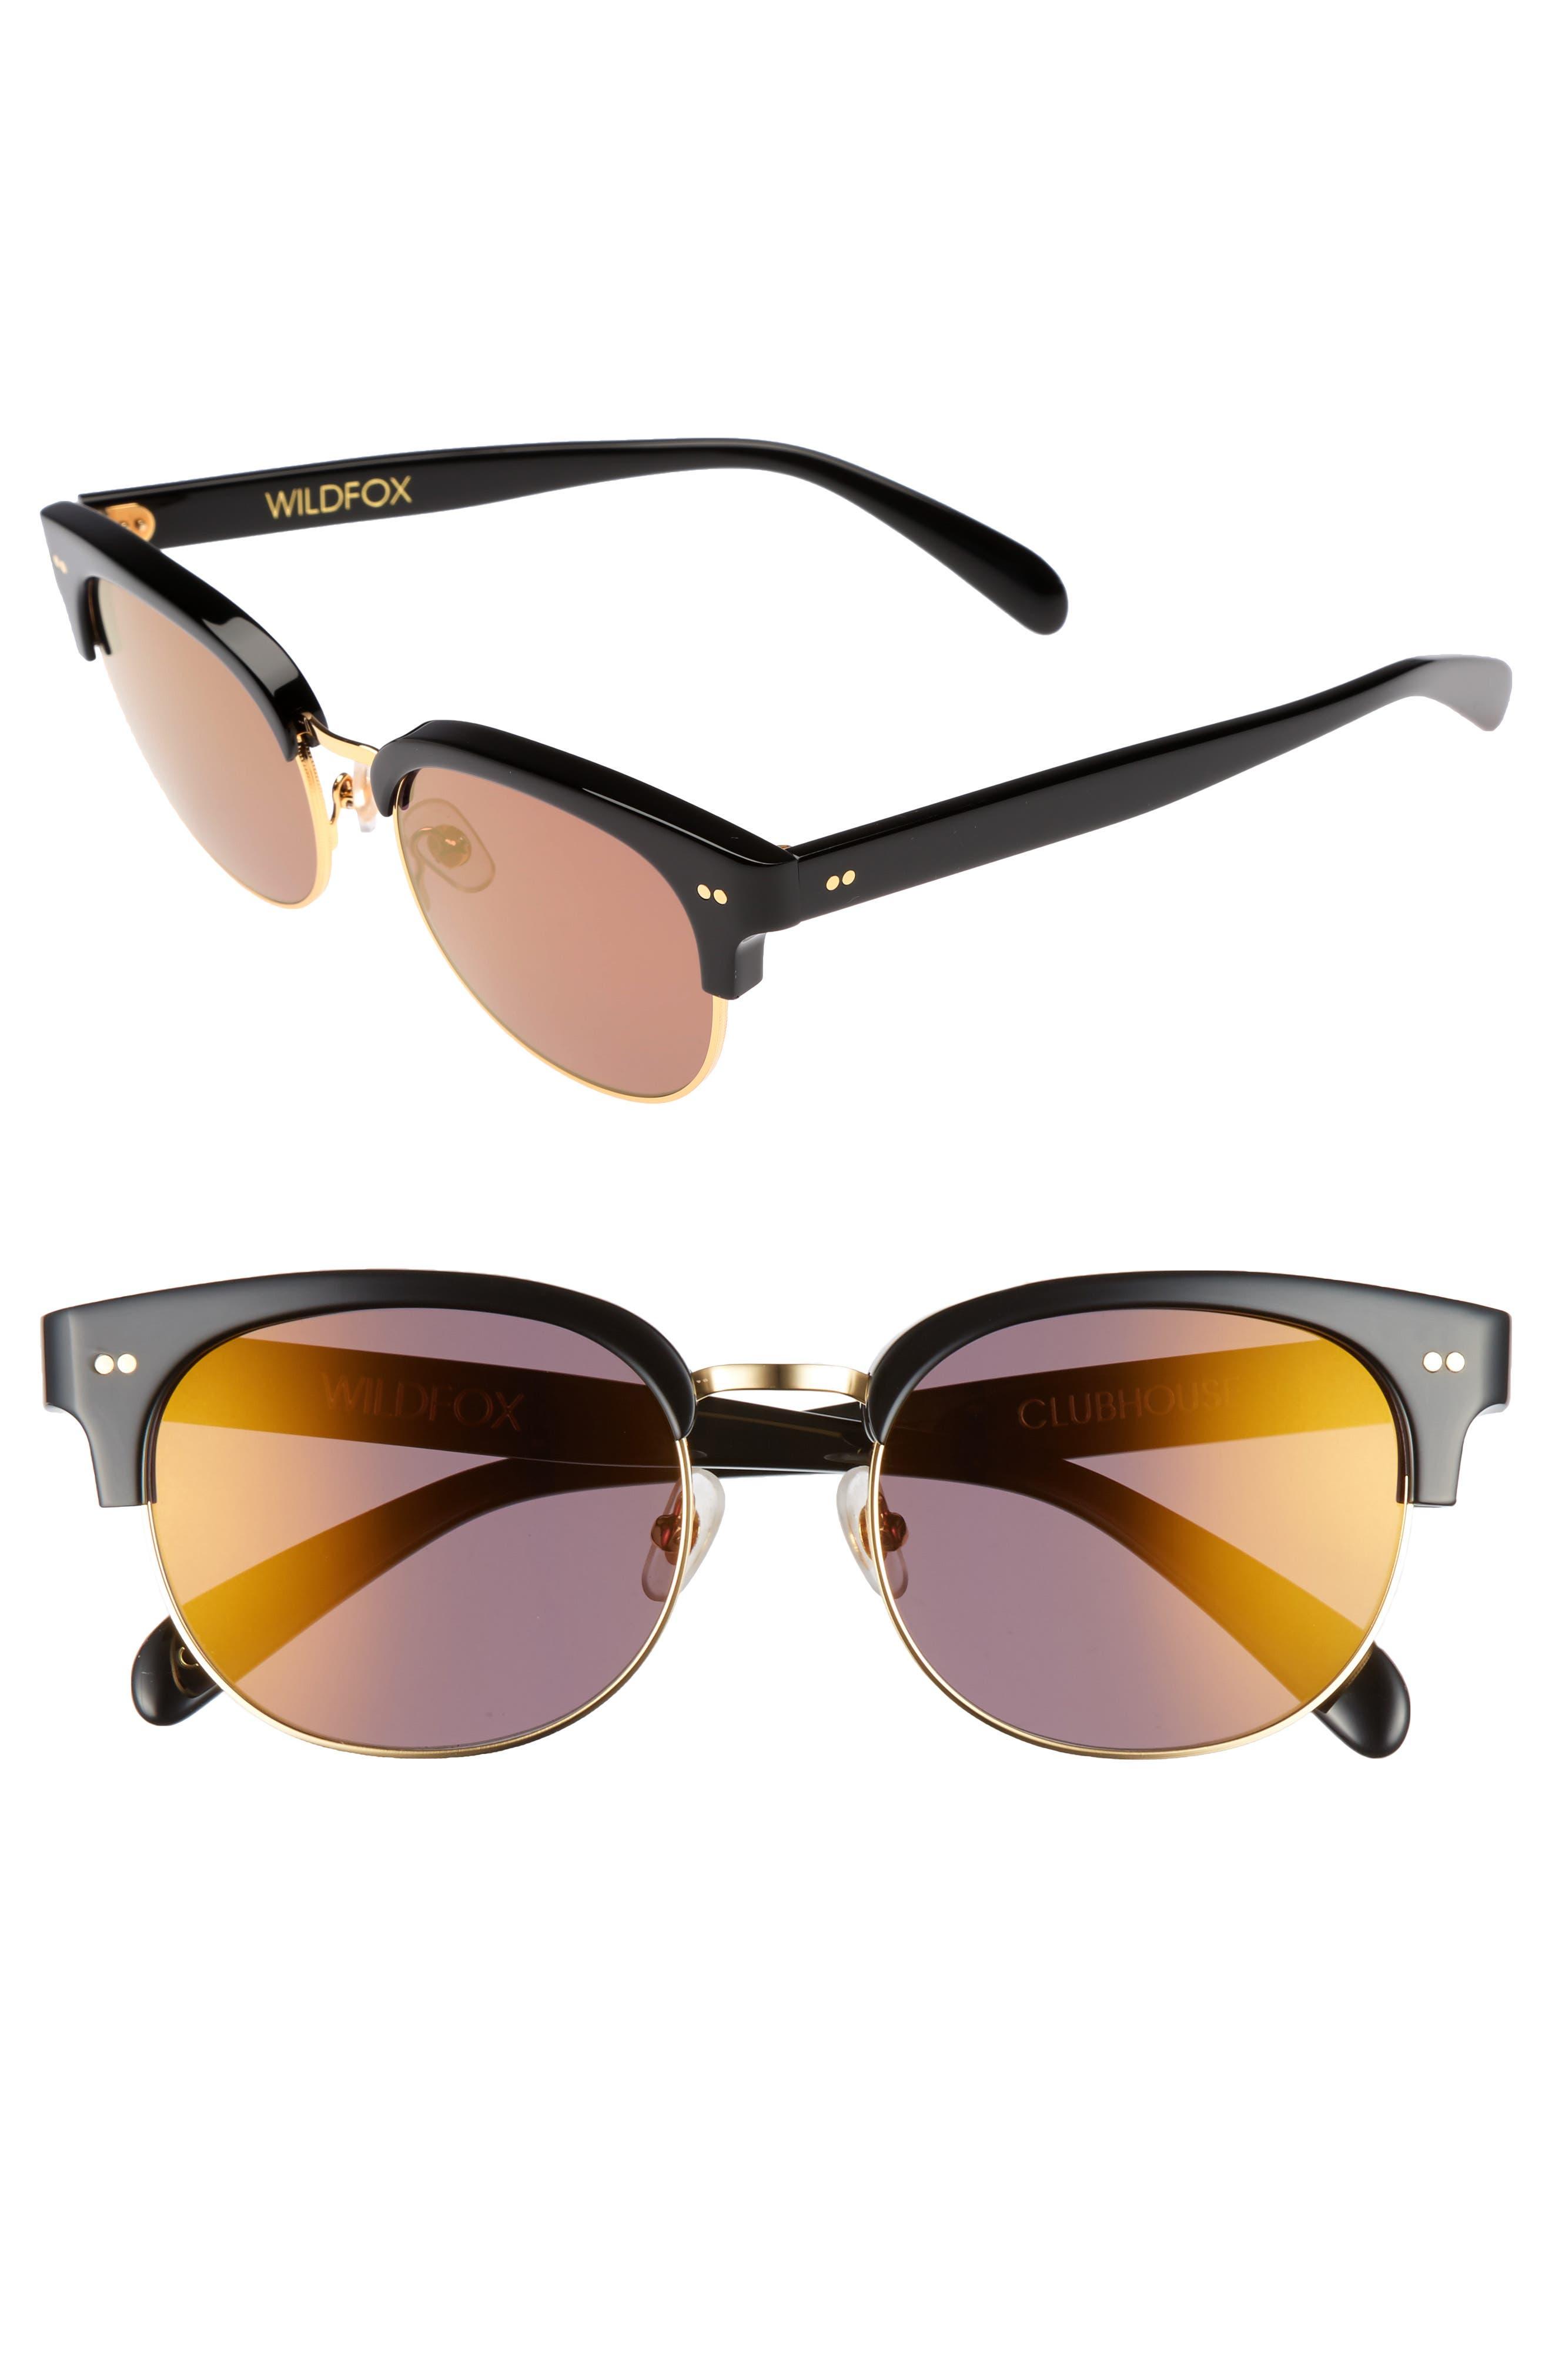 9c886a0bd5 Wildfox Sunglasses for Women